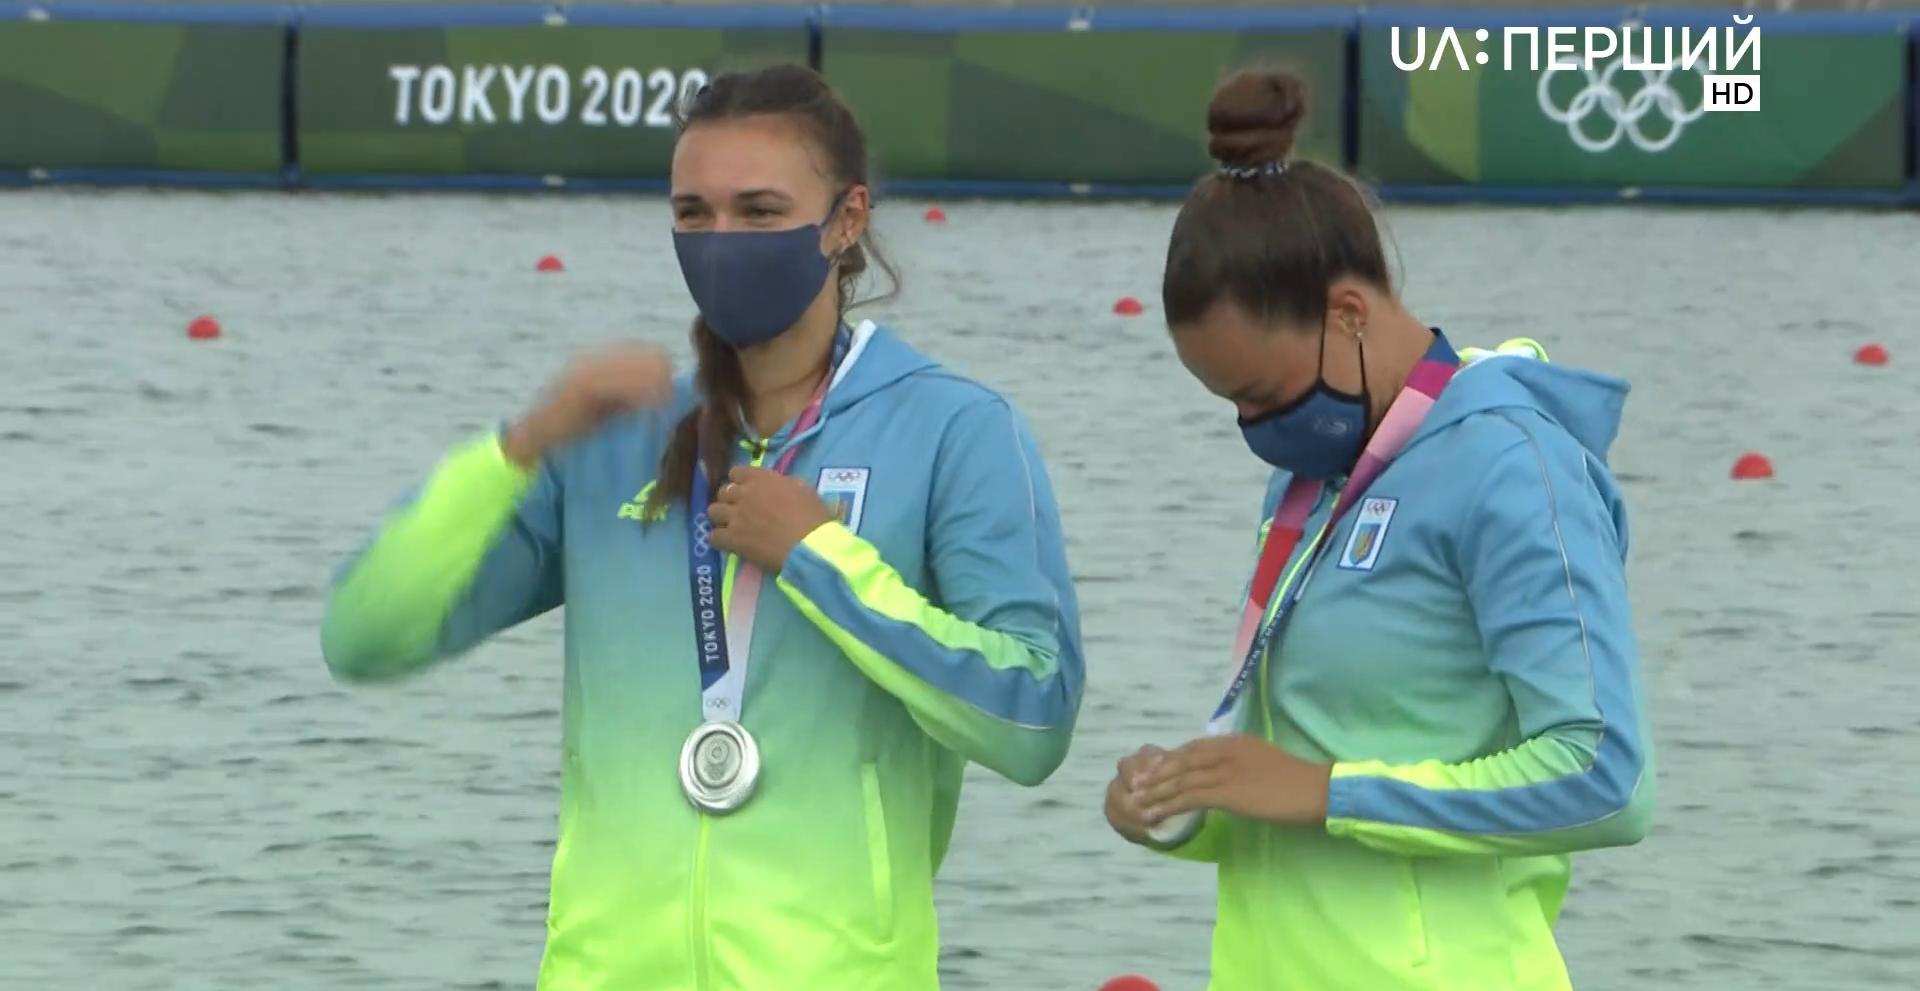 Лузан, Четверикова, каноэ-двойки, Олимпиада-2020, Токио-2020, серебро, спорт, Украина.